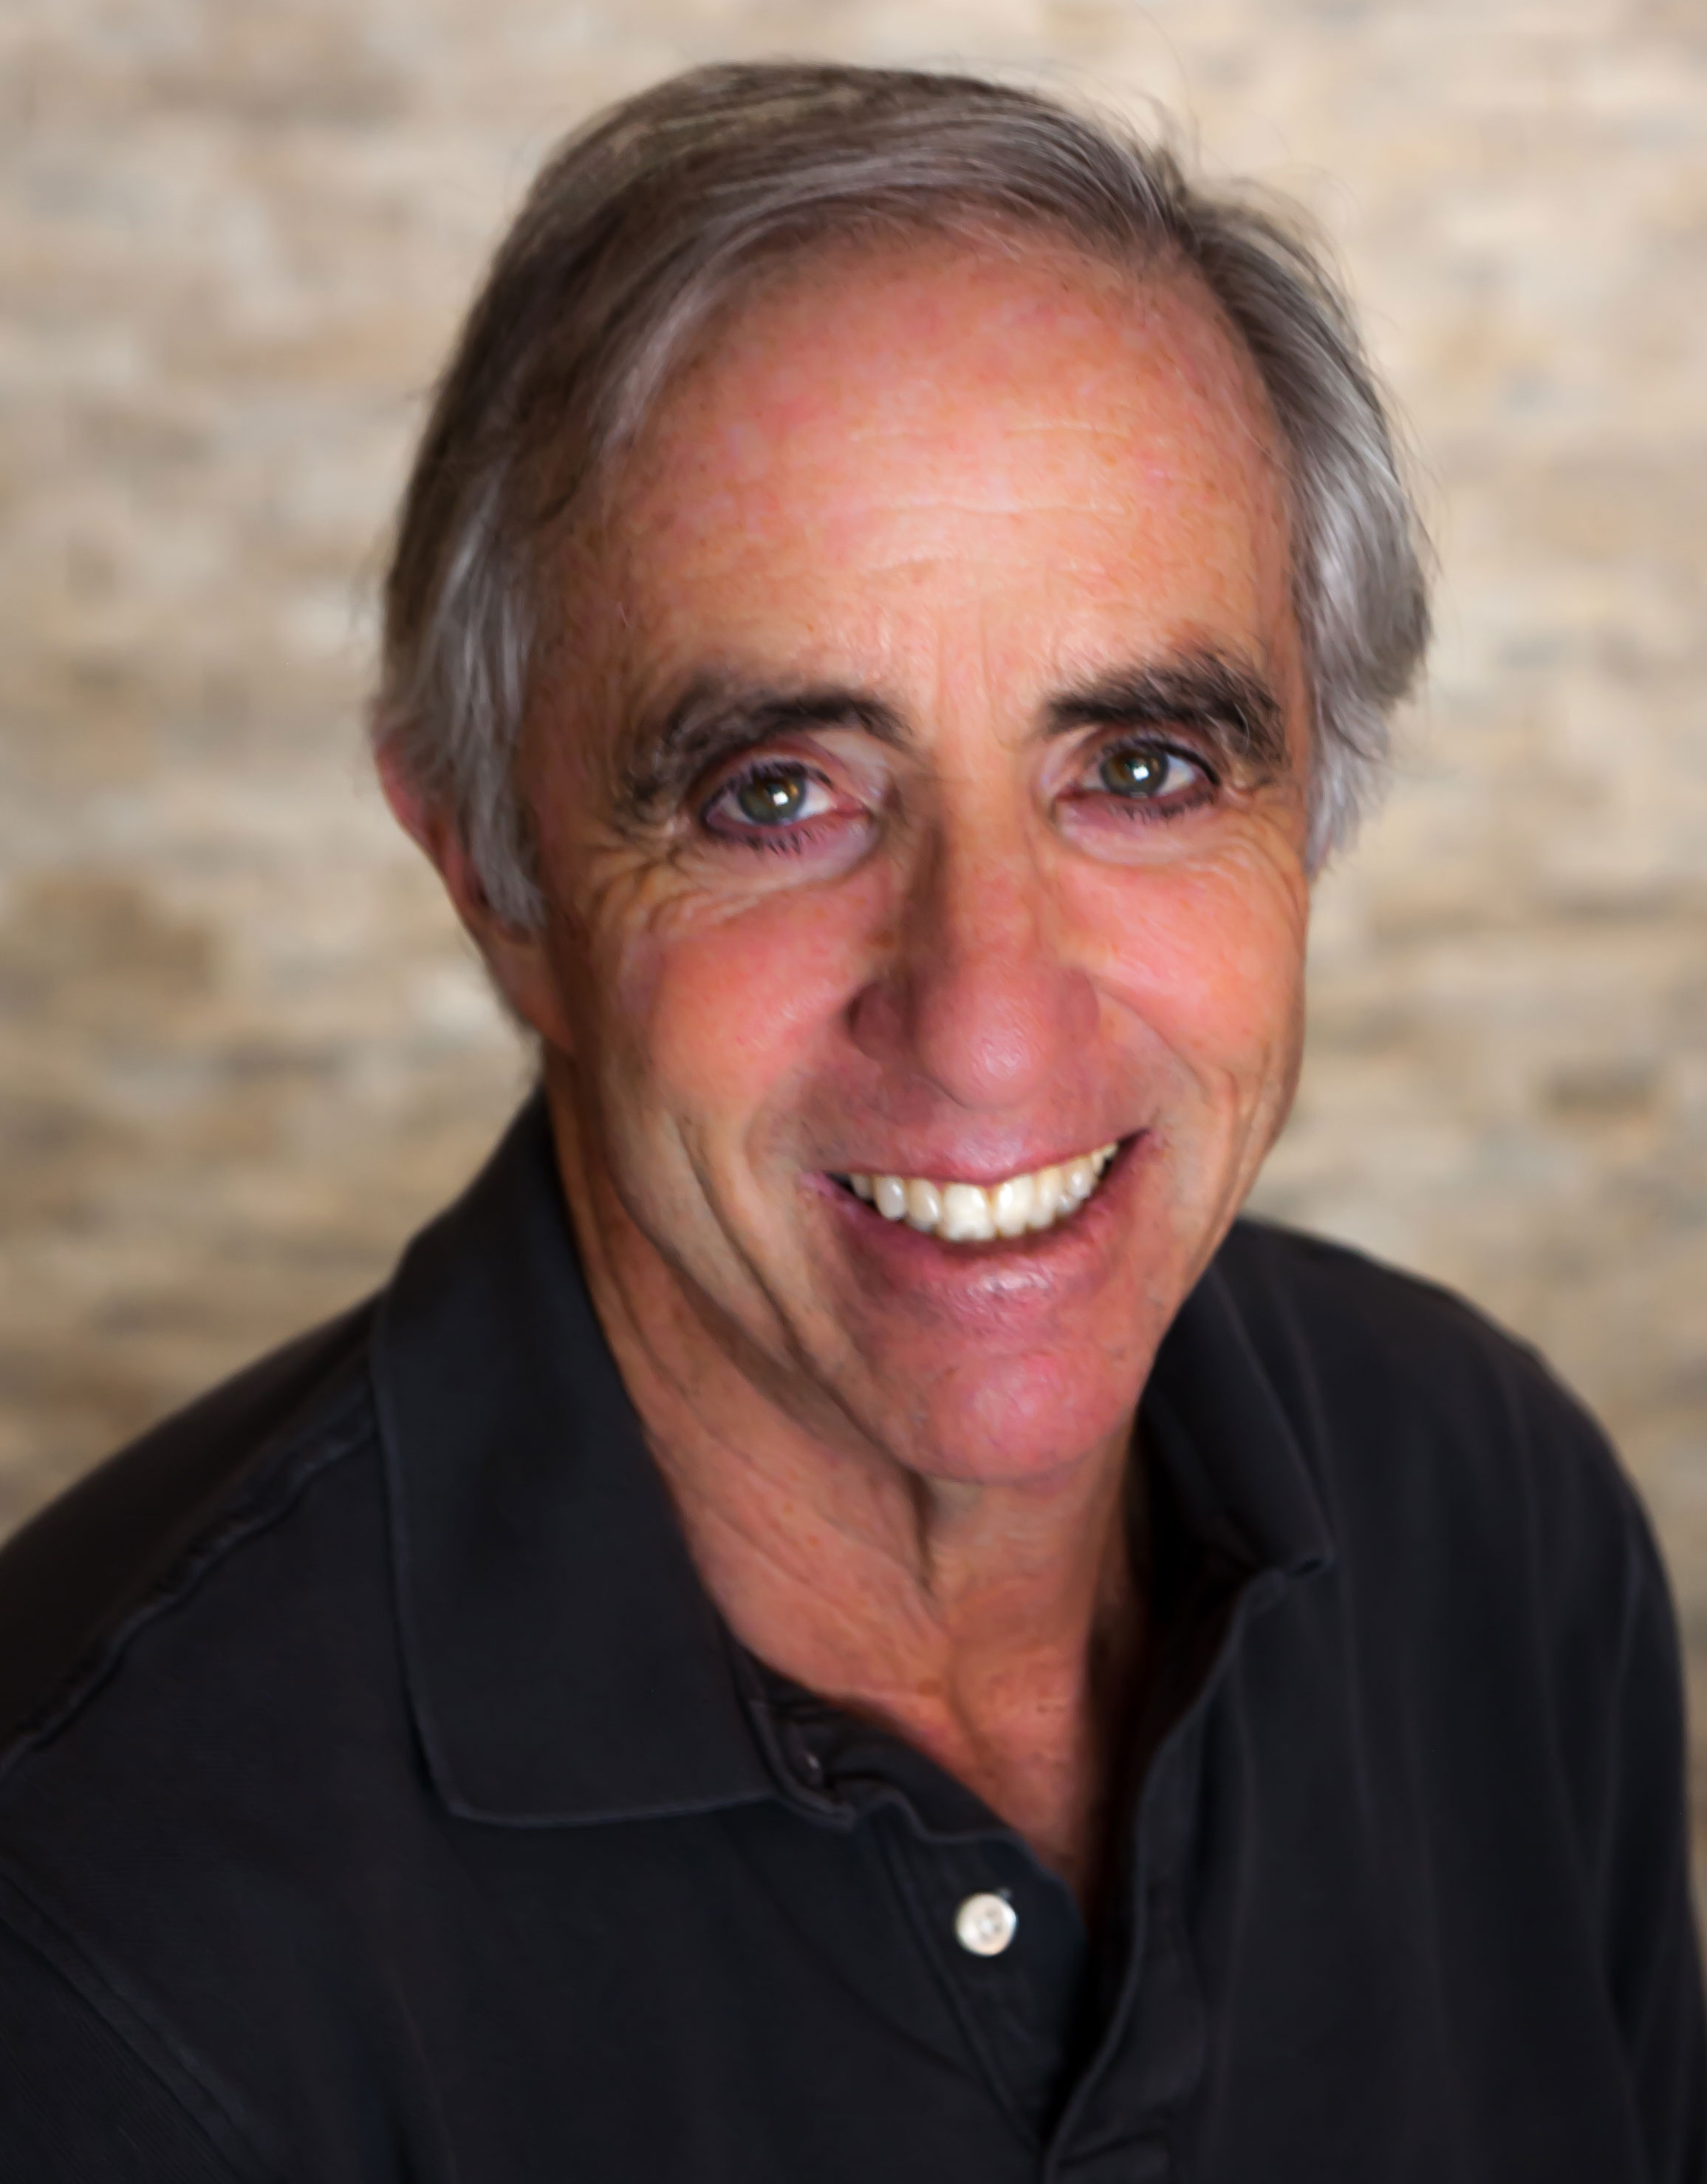 David-Swersky-Dentist.jpg